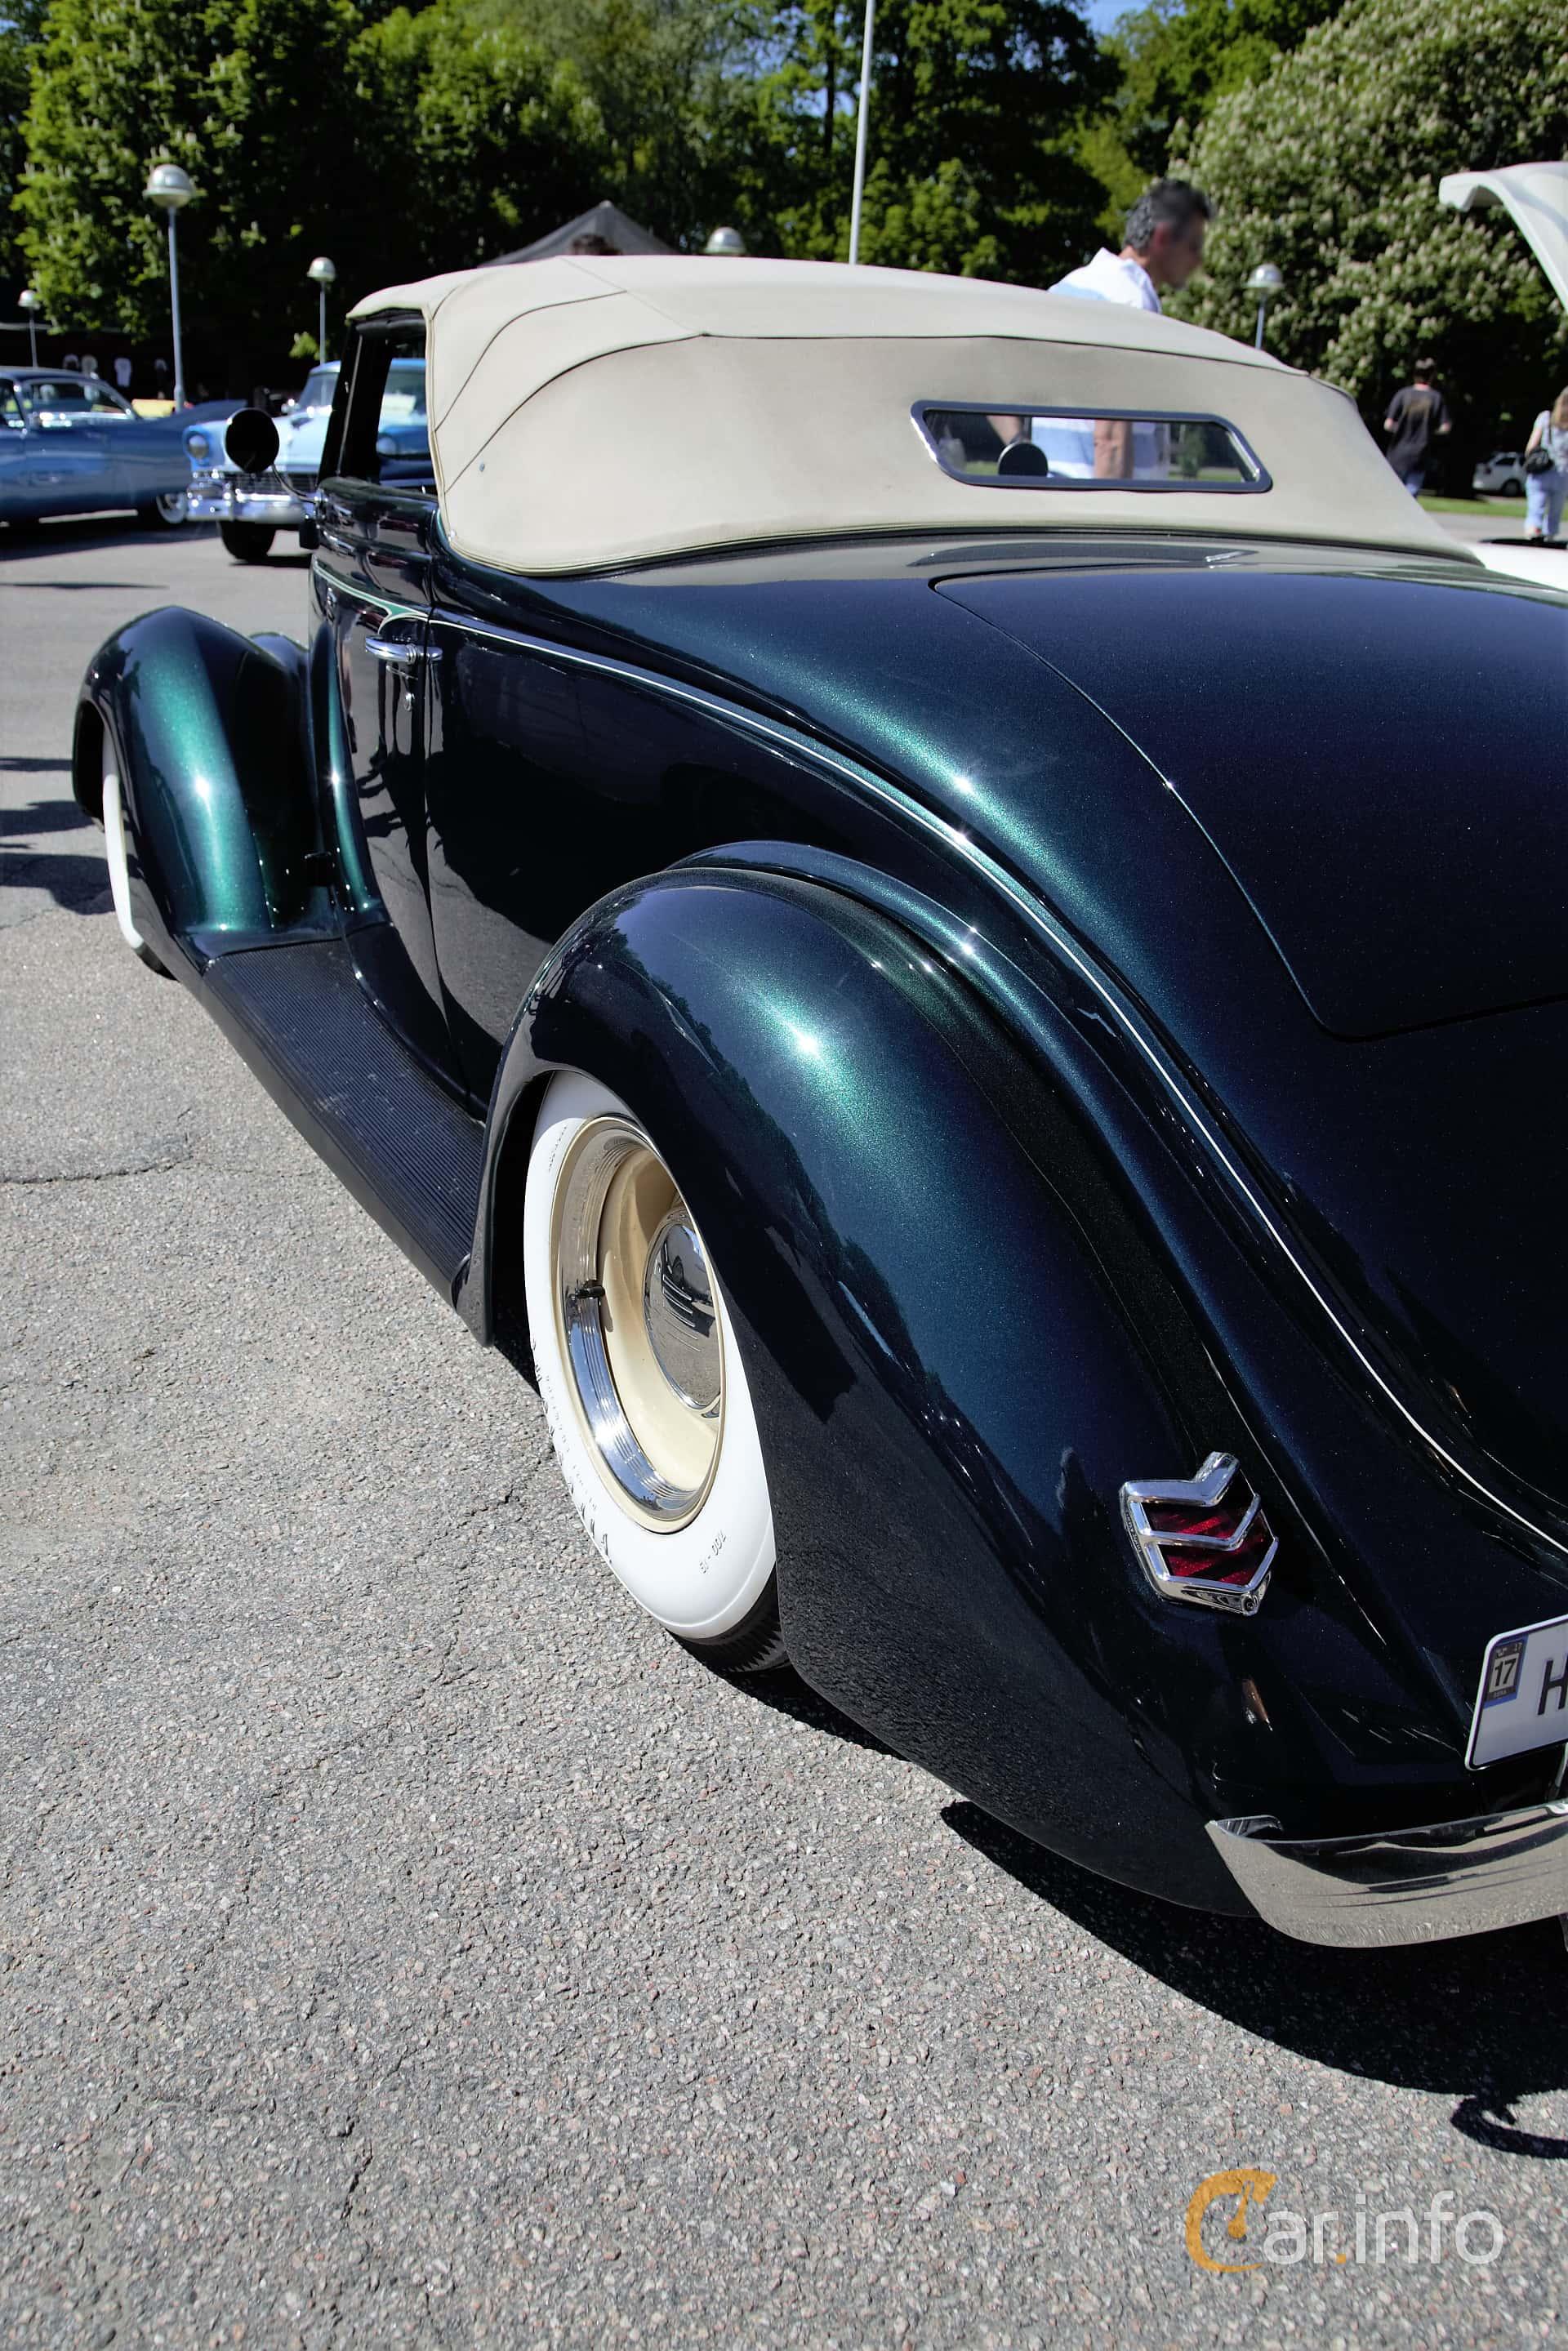 Ford Model 68 Cabriolet 3.6 V8 Manuell, 86hk, 1936